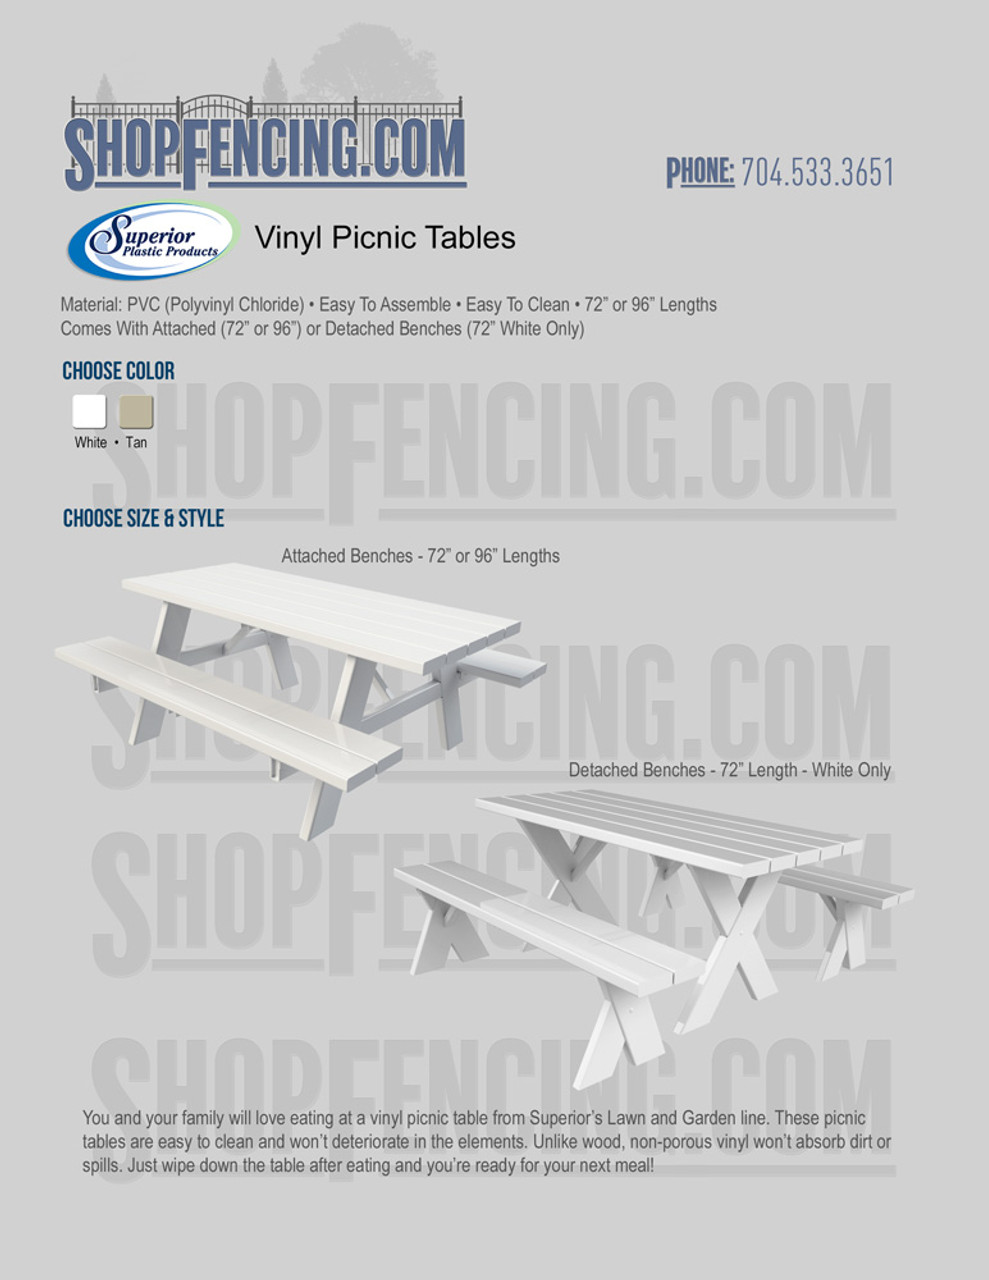 Vinyl Picnic Tables From ShopFencing.com